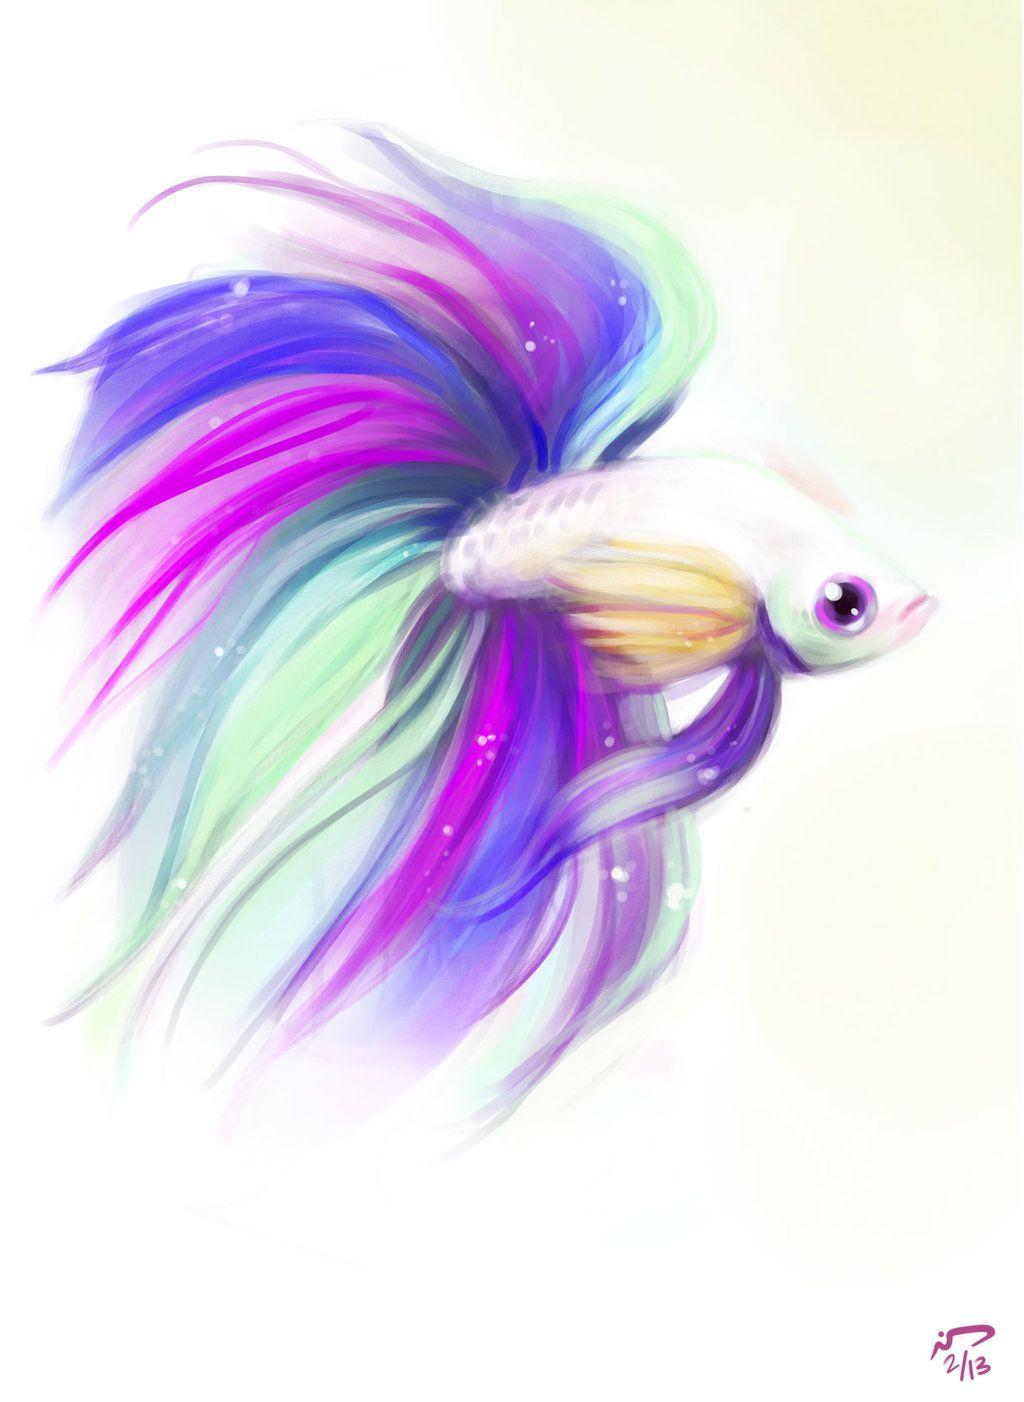 Celestial Betta By Majoh On Deviantart Fish Drawings Watercolor Fish Fish Art